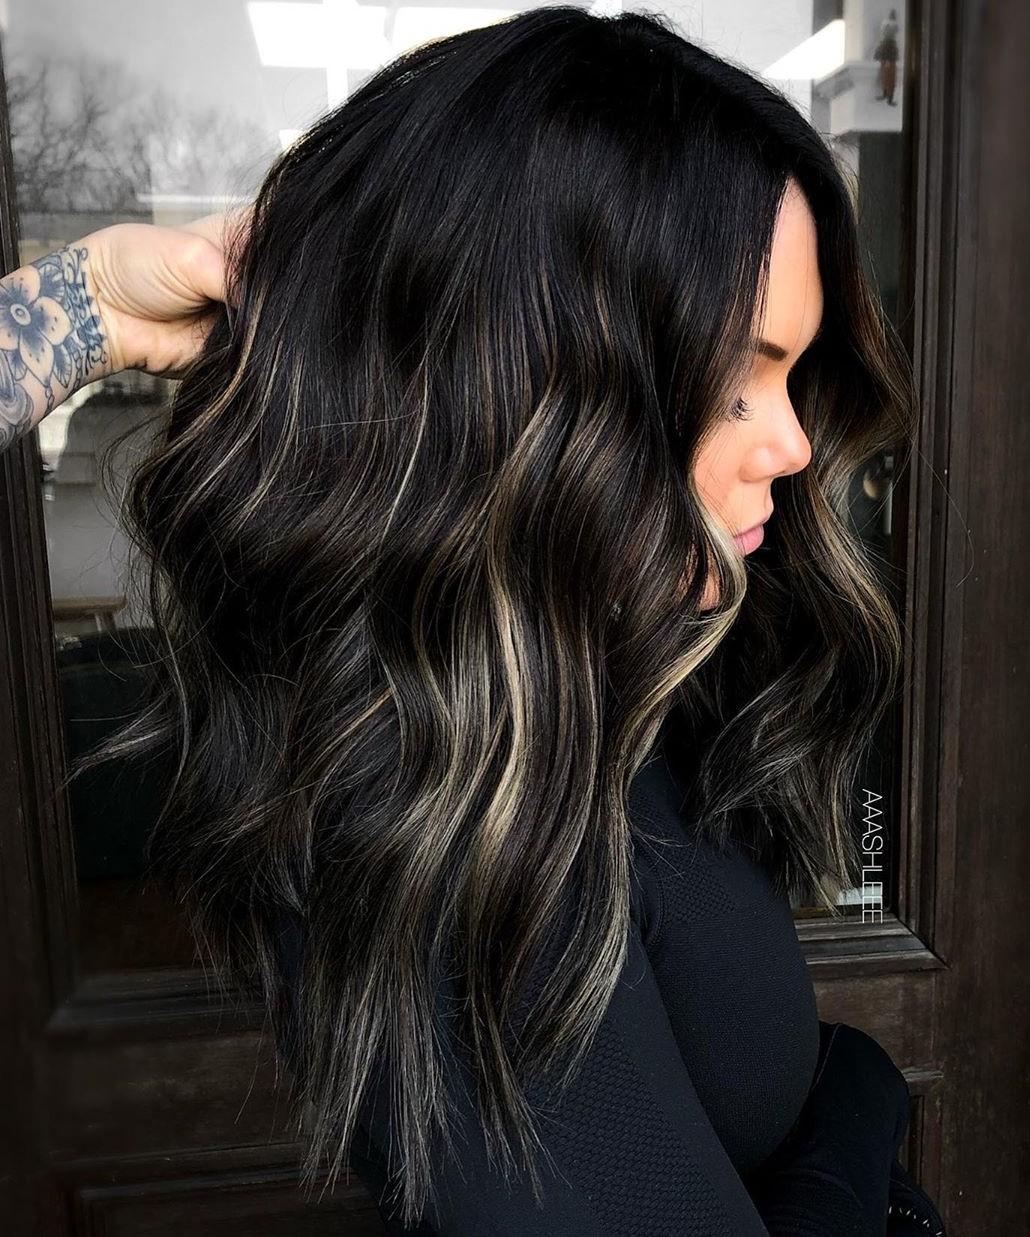 highlights dark blonde peekaboo hadviser rock preto raven colors highlighted african caramel soft dyed gray blond